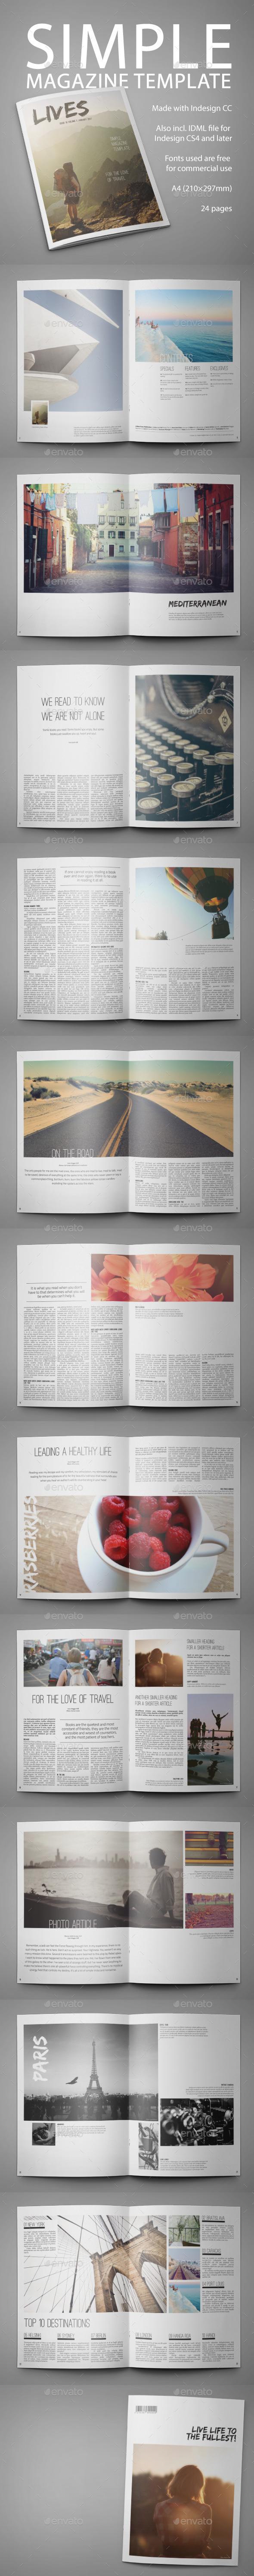 Simple Multipurpose Magazine Template - Magazines Print Templates